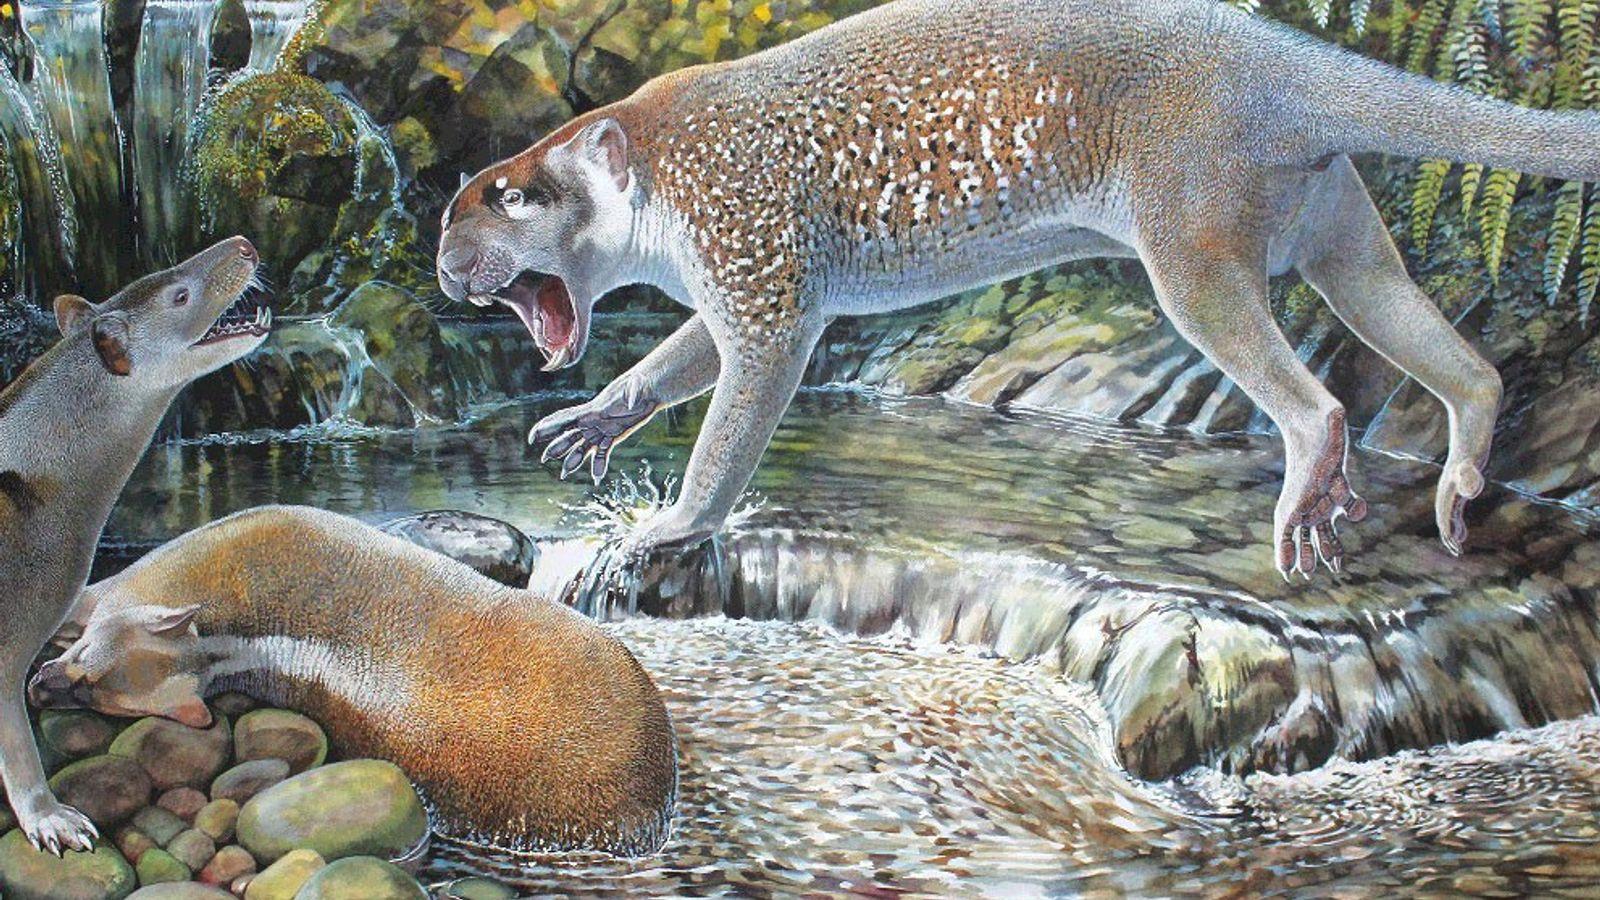 León marsupial